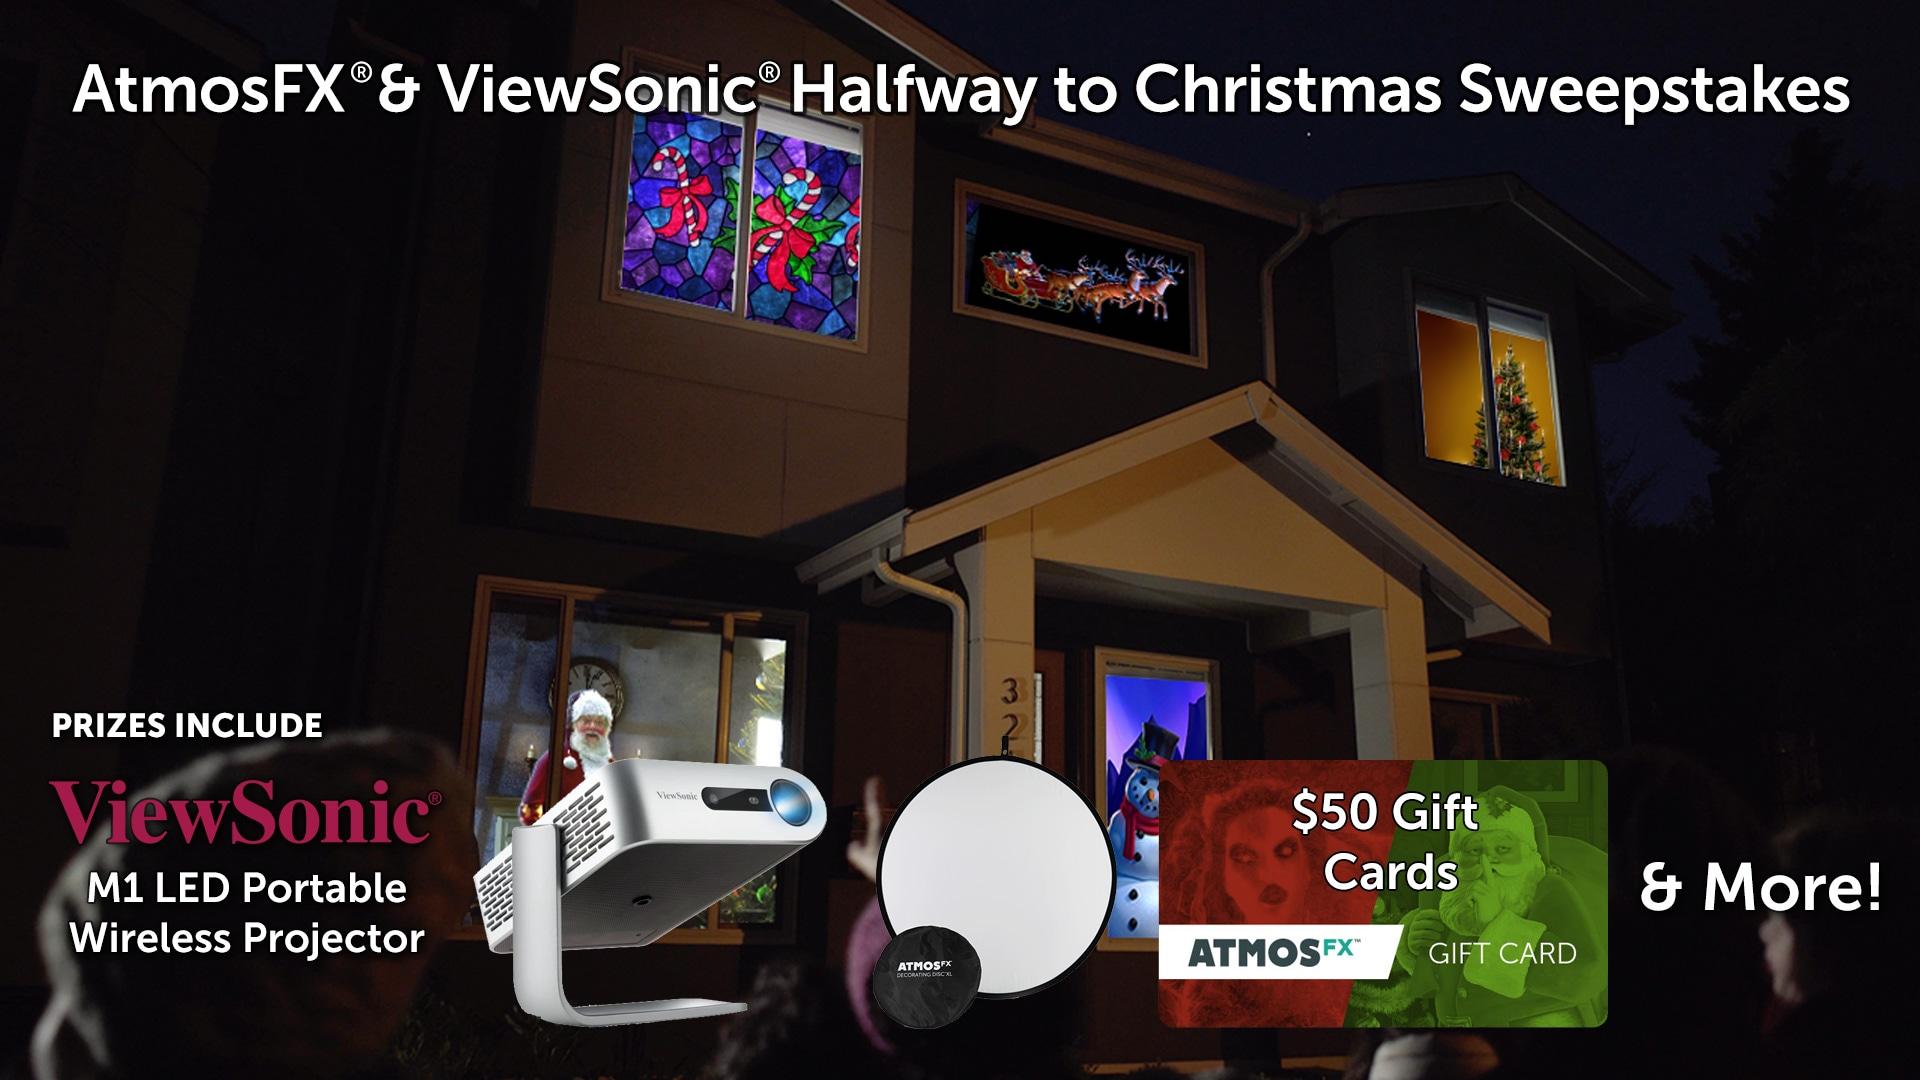 AtmosFX® & ViewSonic® Halfway To Christmas Sweepstakes Giveaway Image